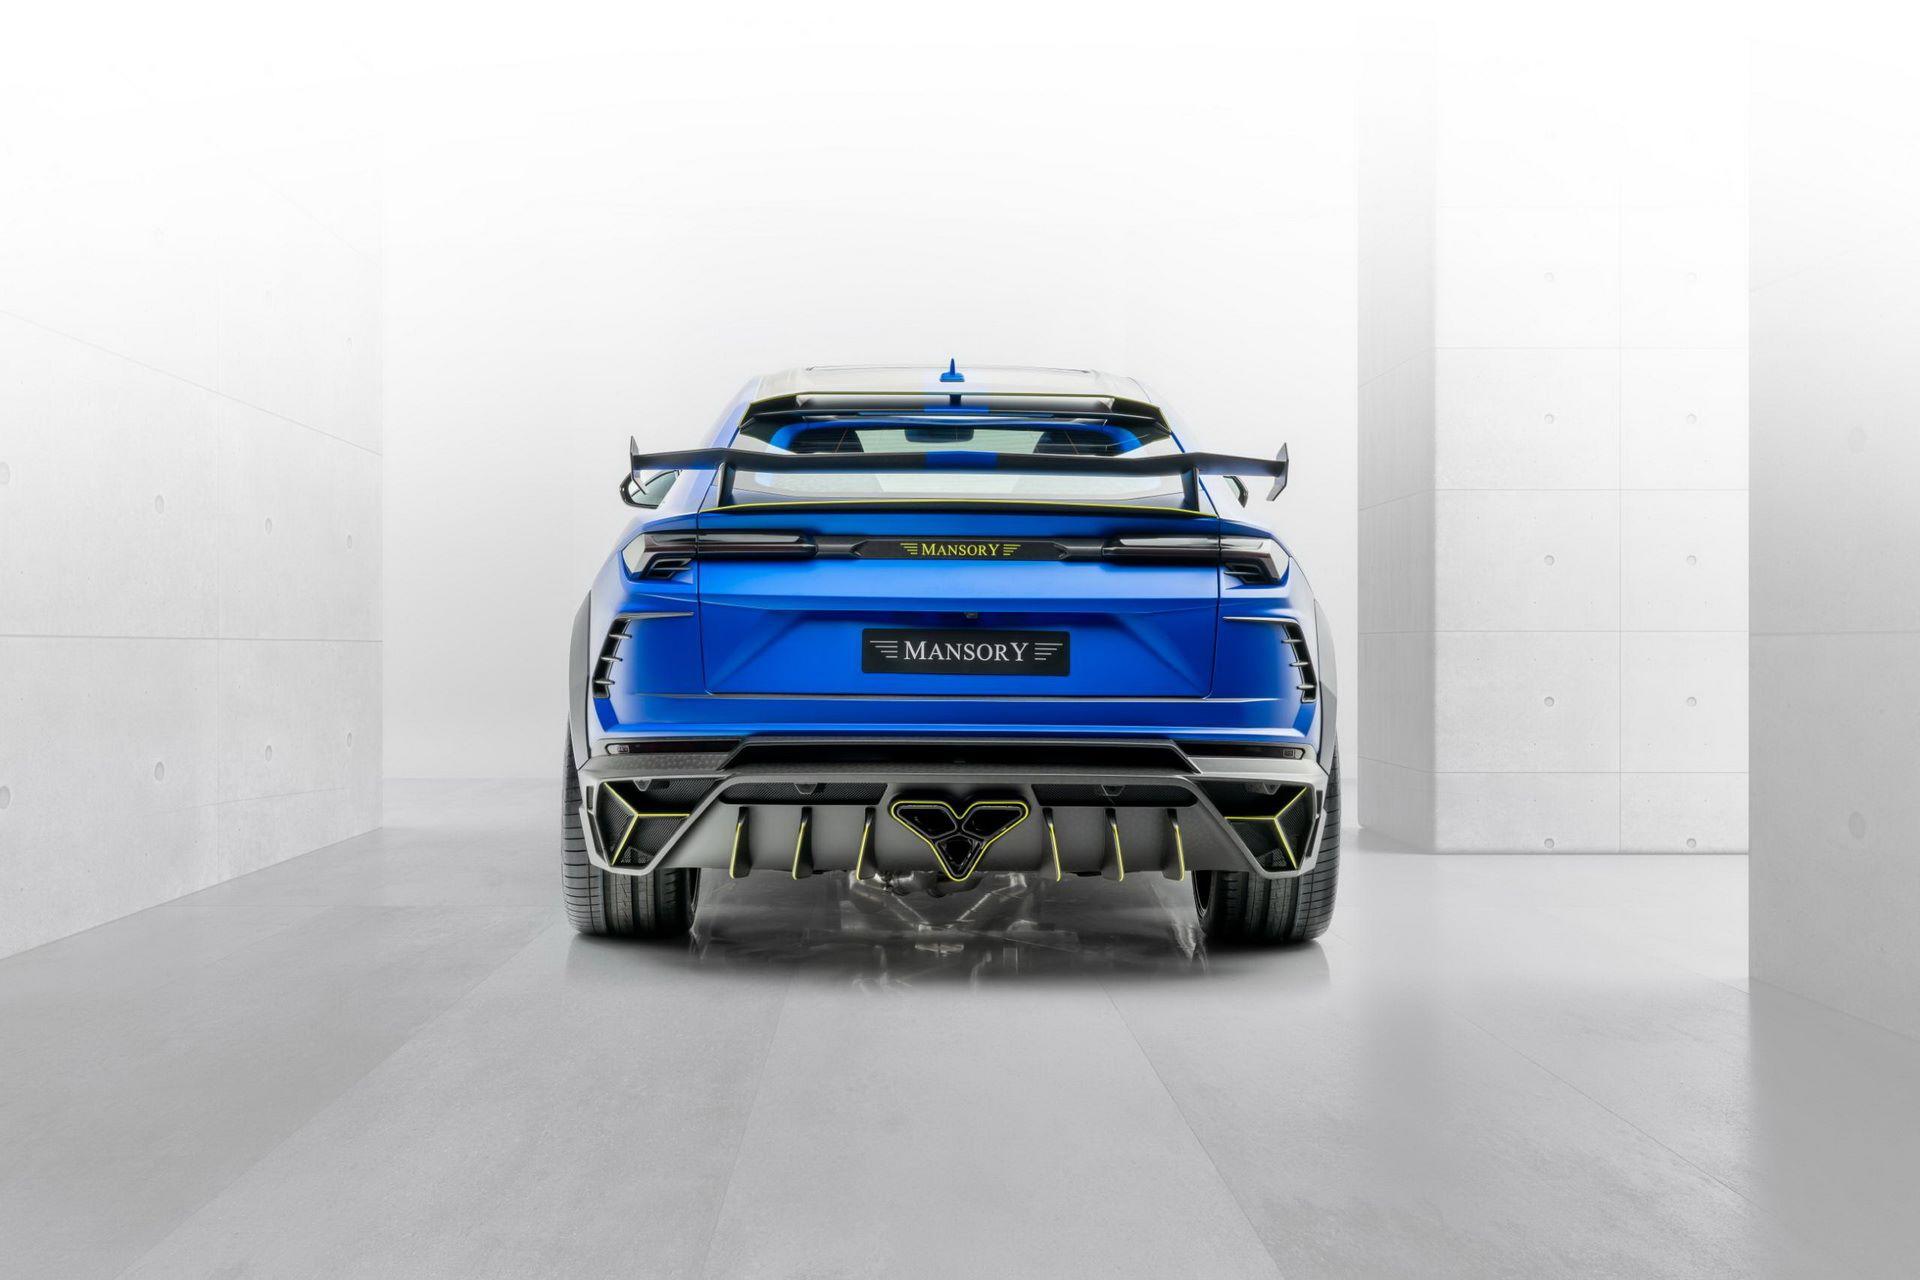 Lamborghini-Urus-Mansory-Venatus-4